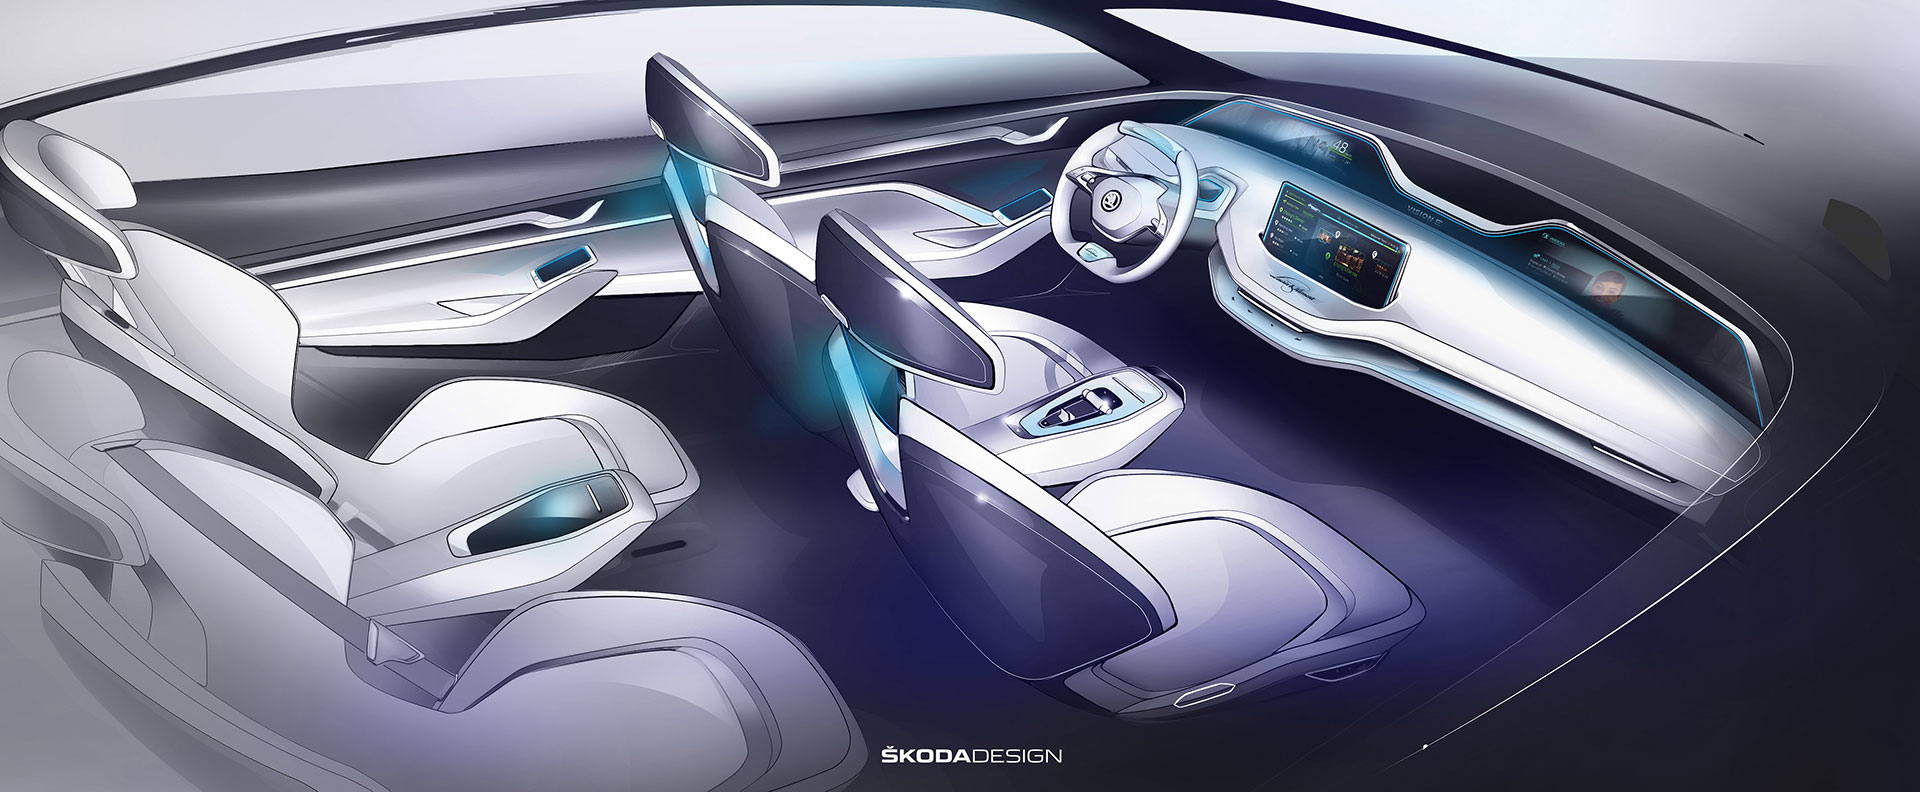 World Car Kia >> Skoda Vision E Concept Interior Design Sketch Render - Car Body Design